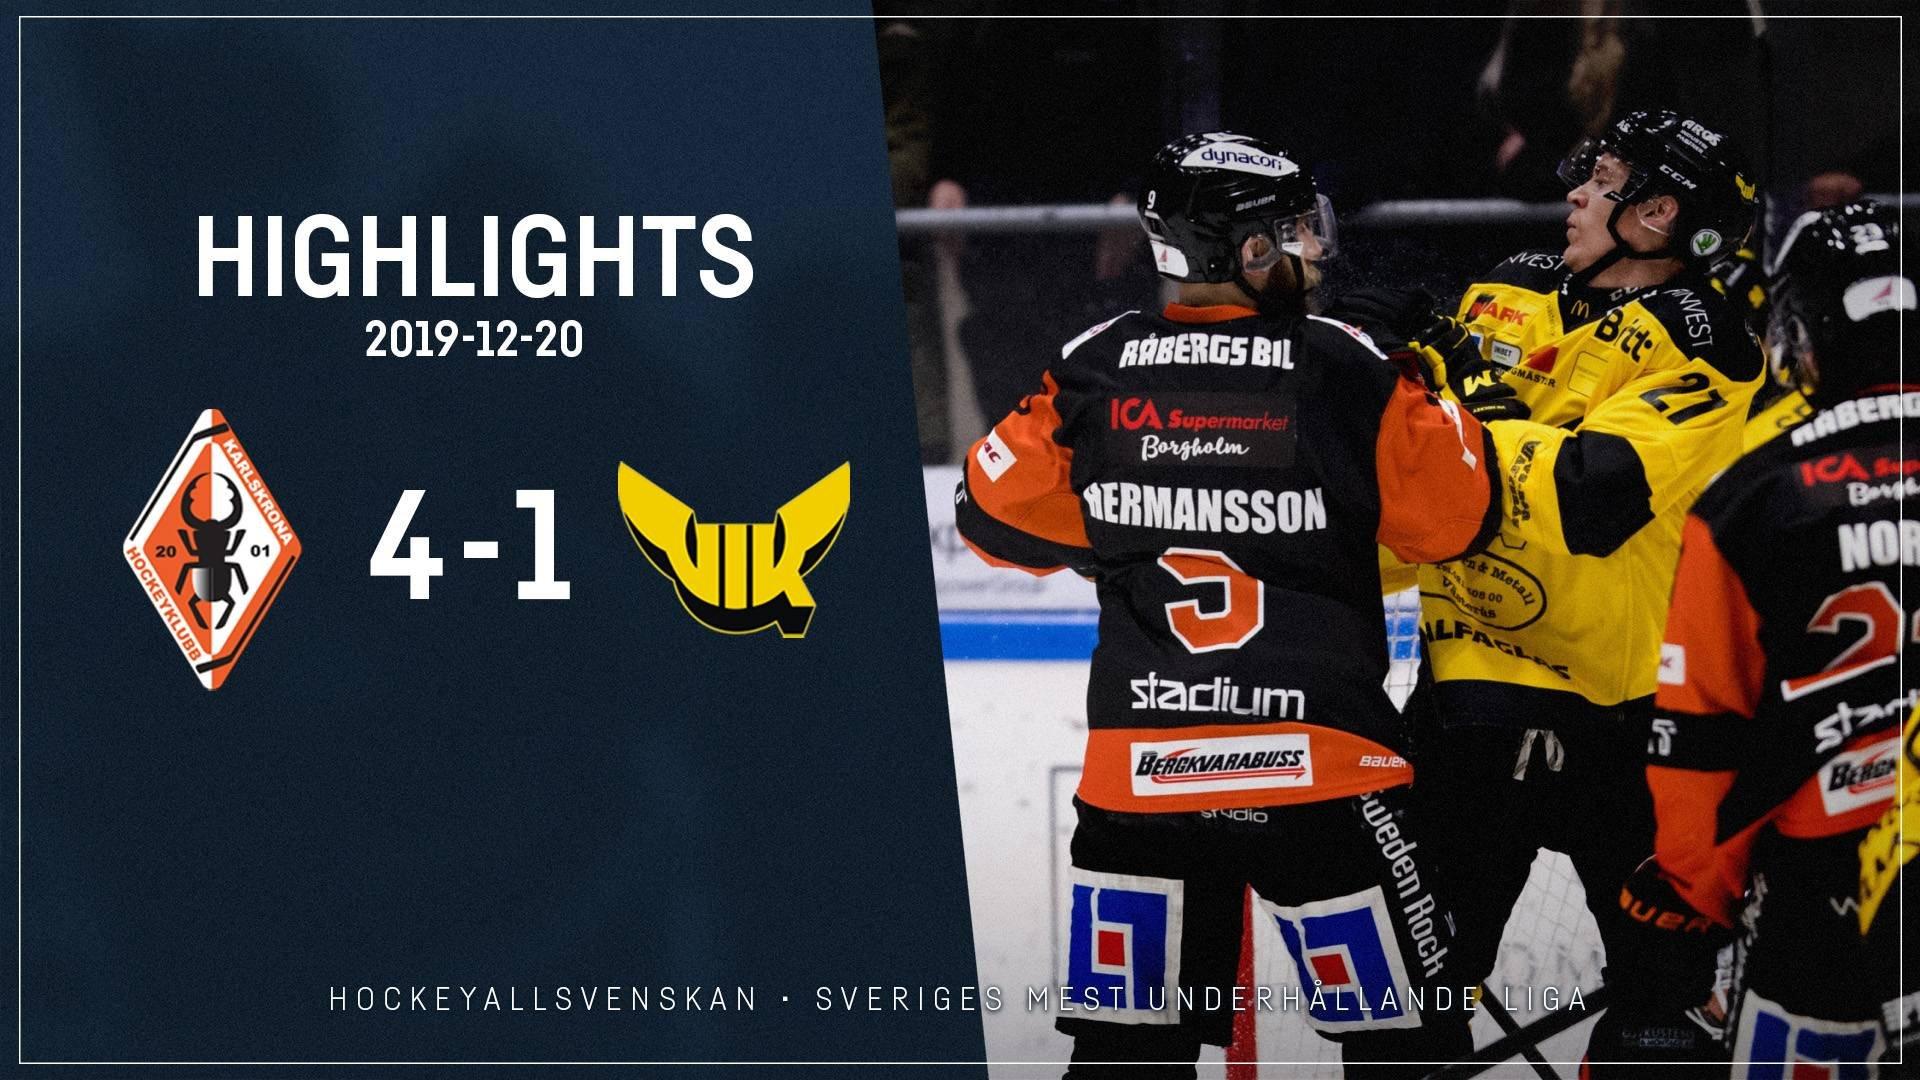 2019-12-20 Karlskrona - Västerås 4-1